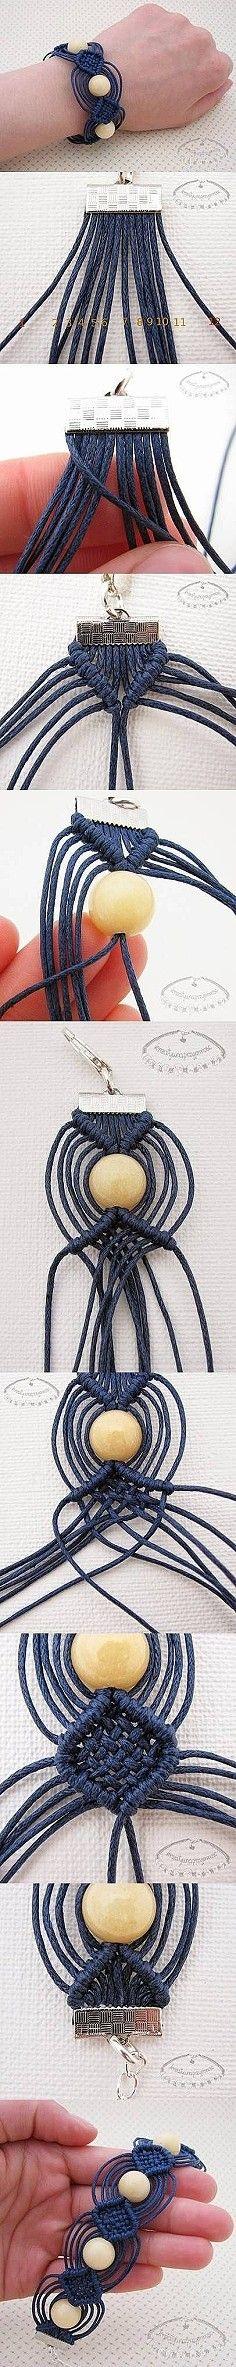 DIY handmade knit # life DIY # @ A7L5P